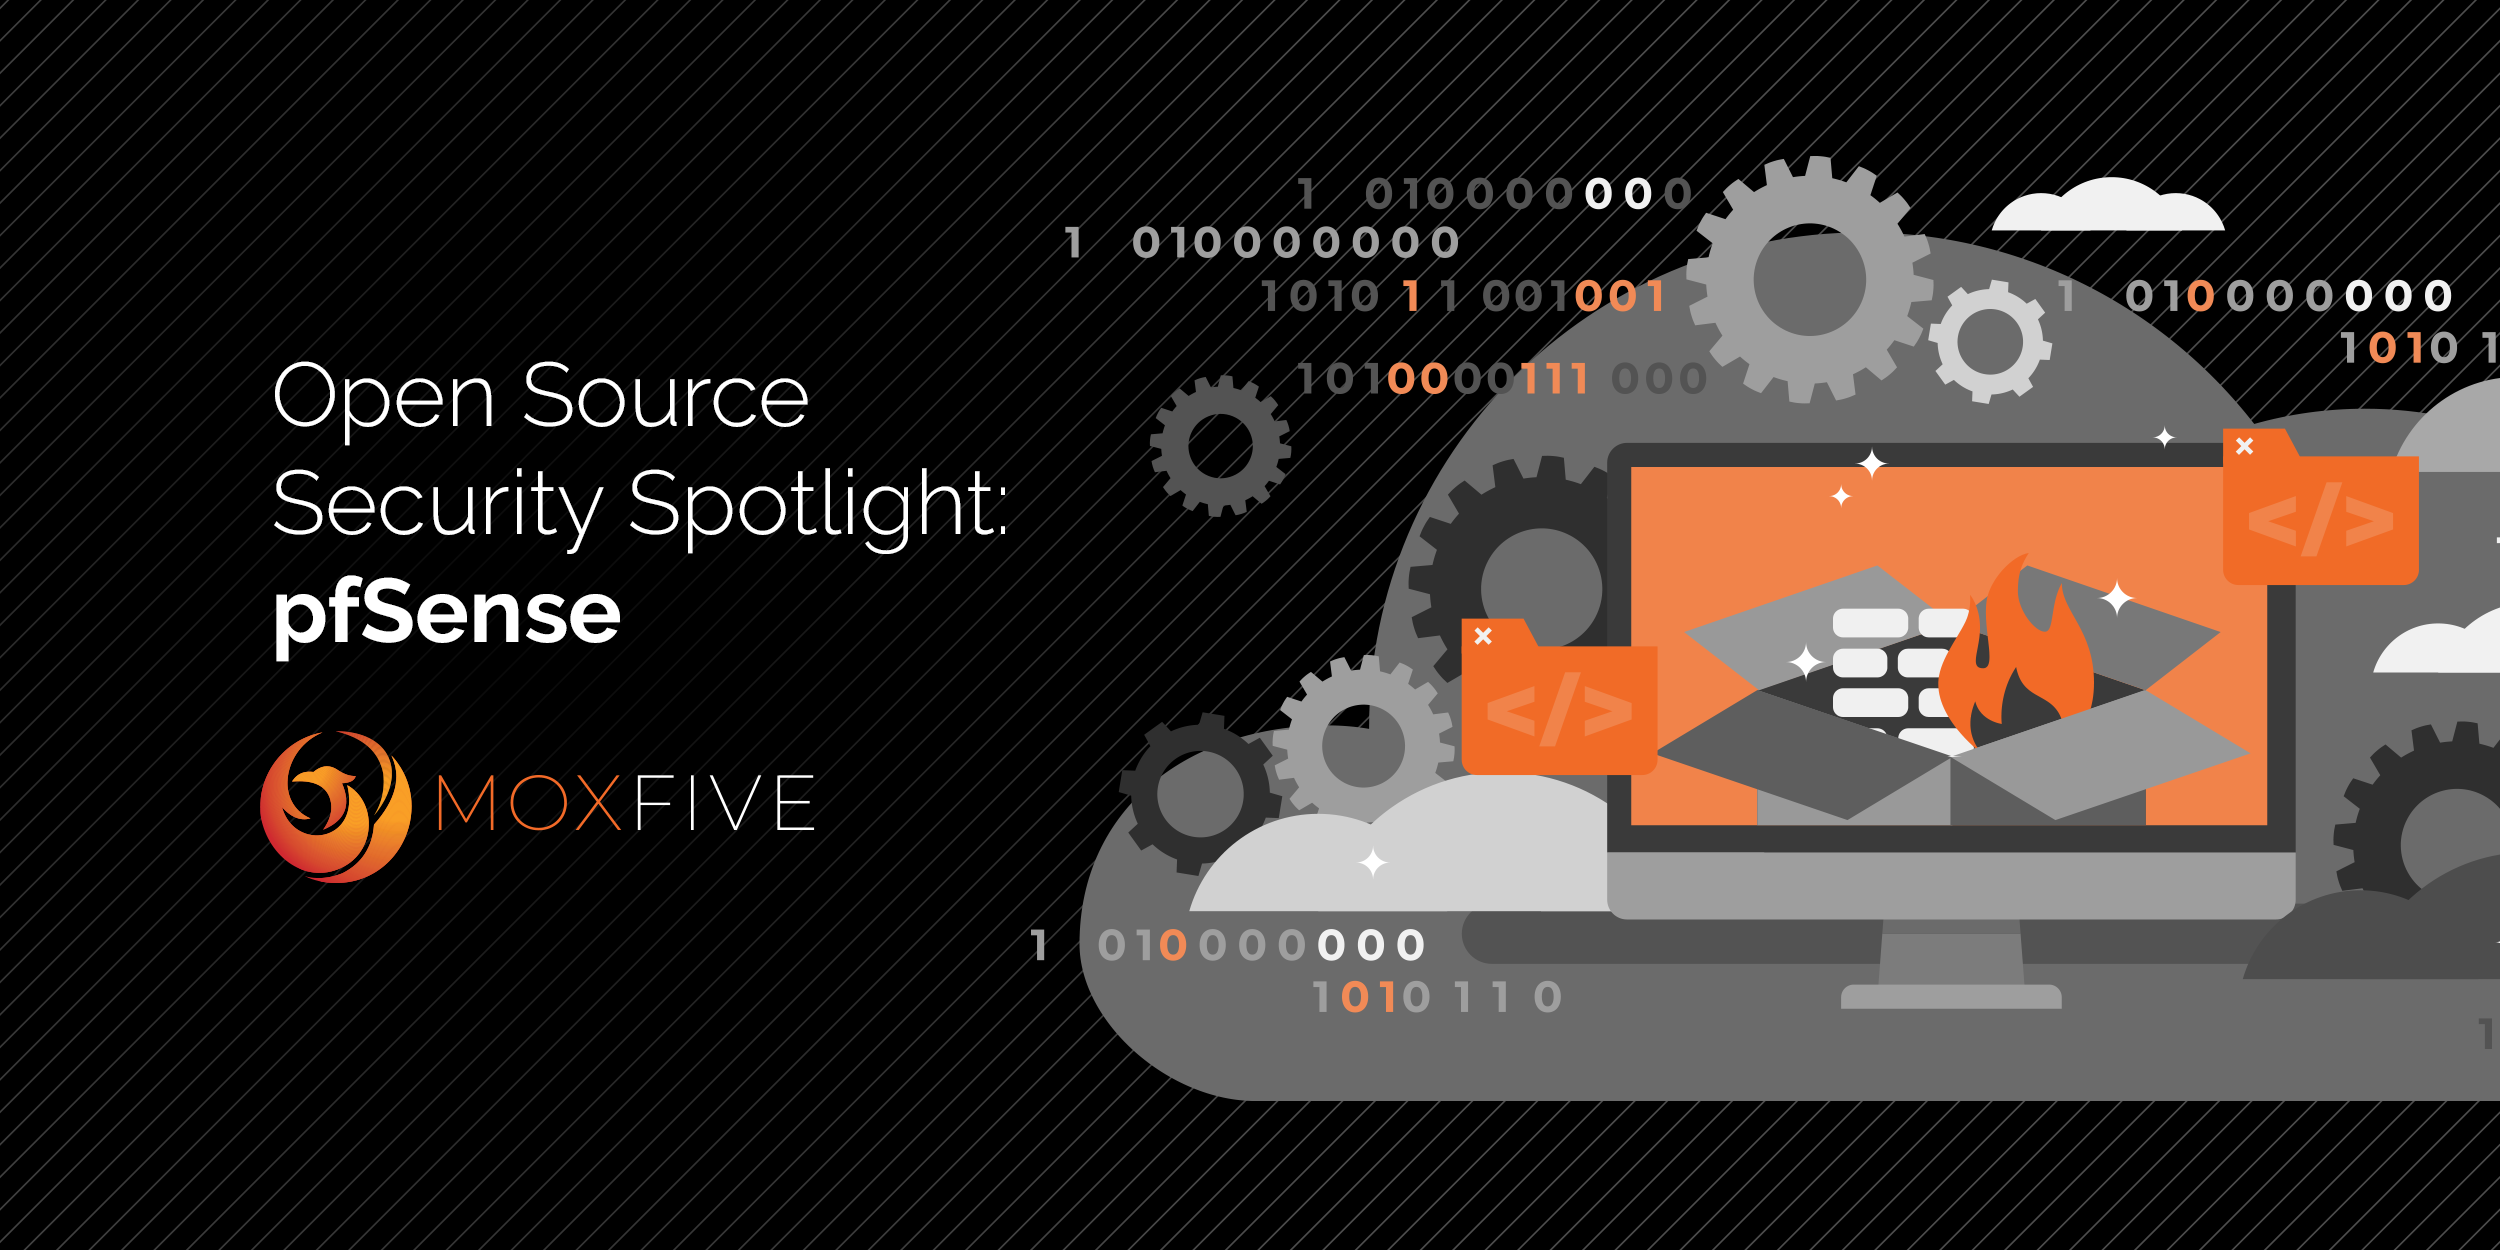 Open-source Security Spotlight: pfSense